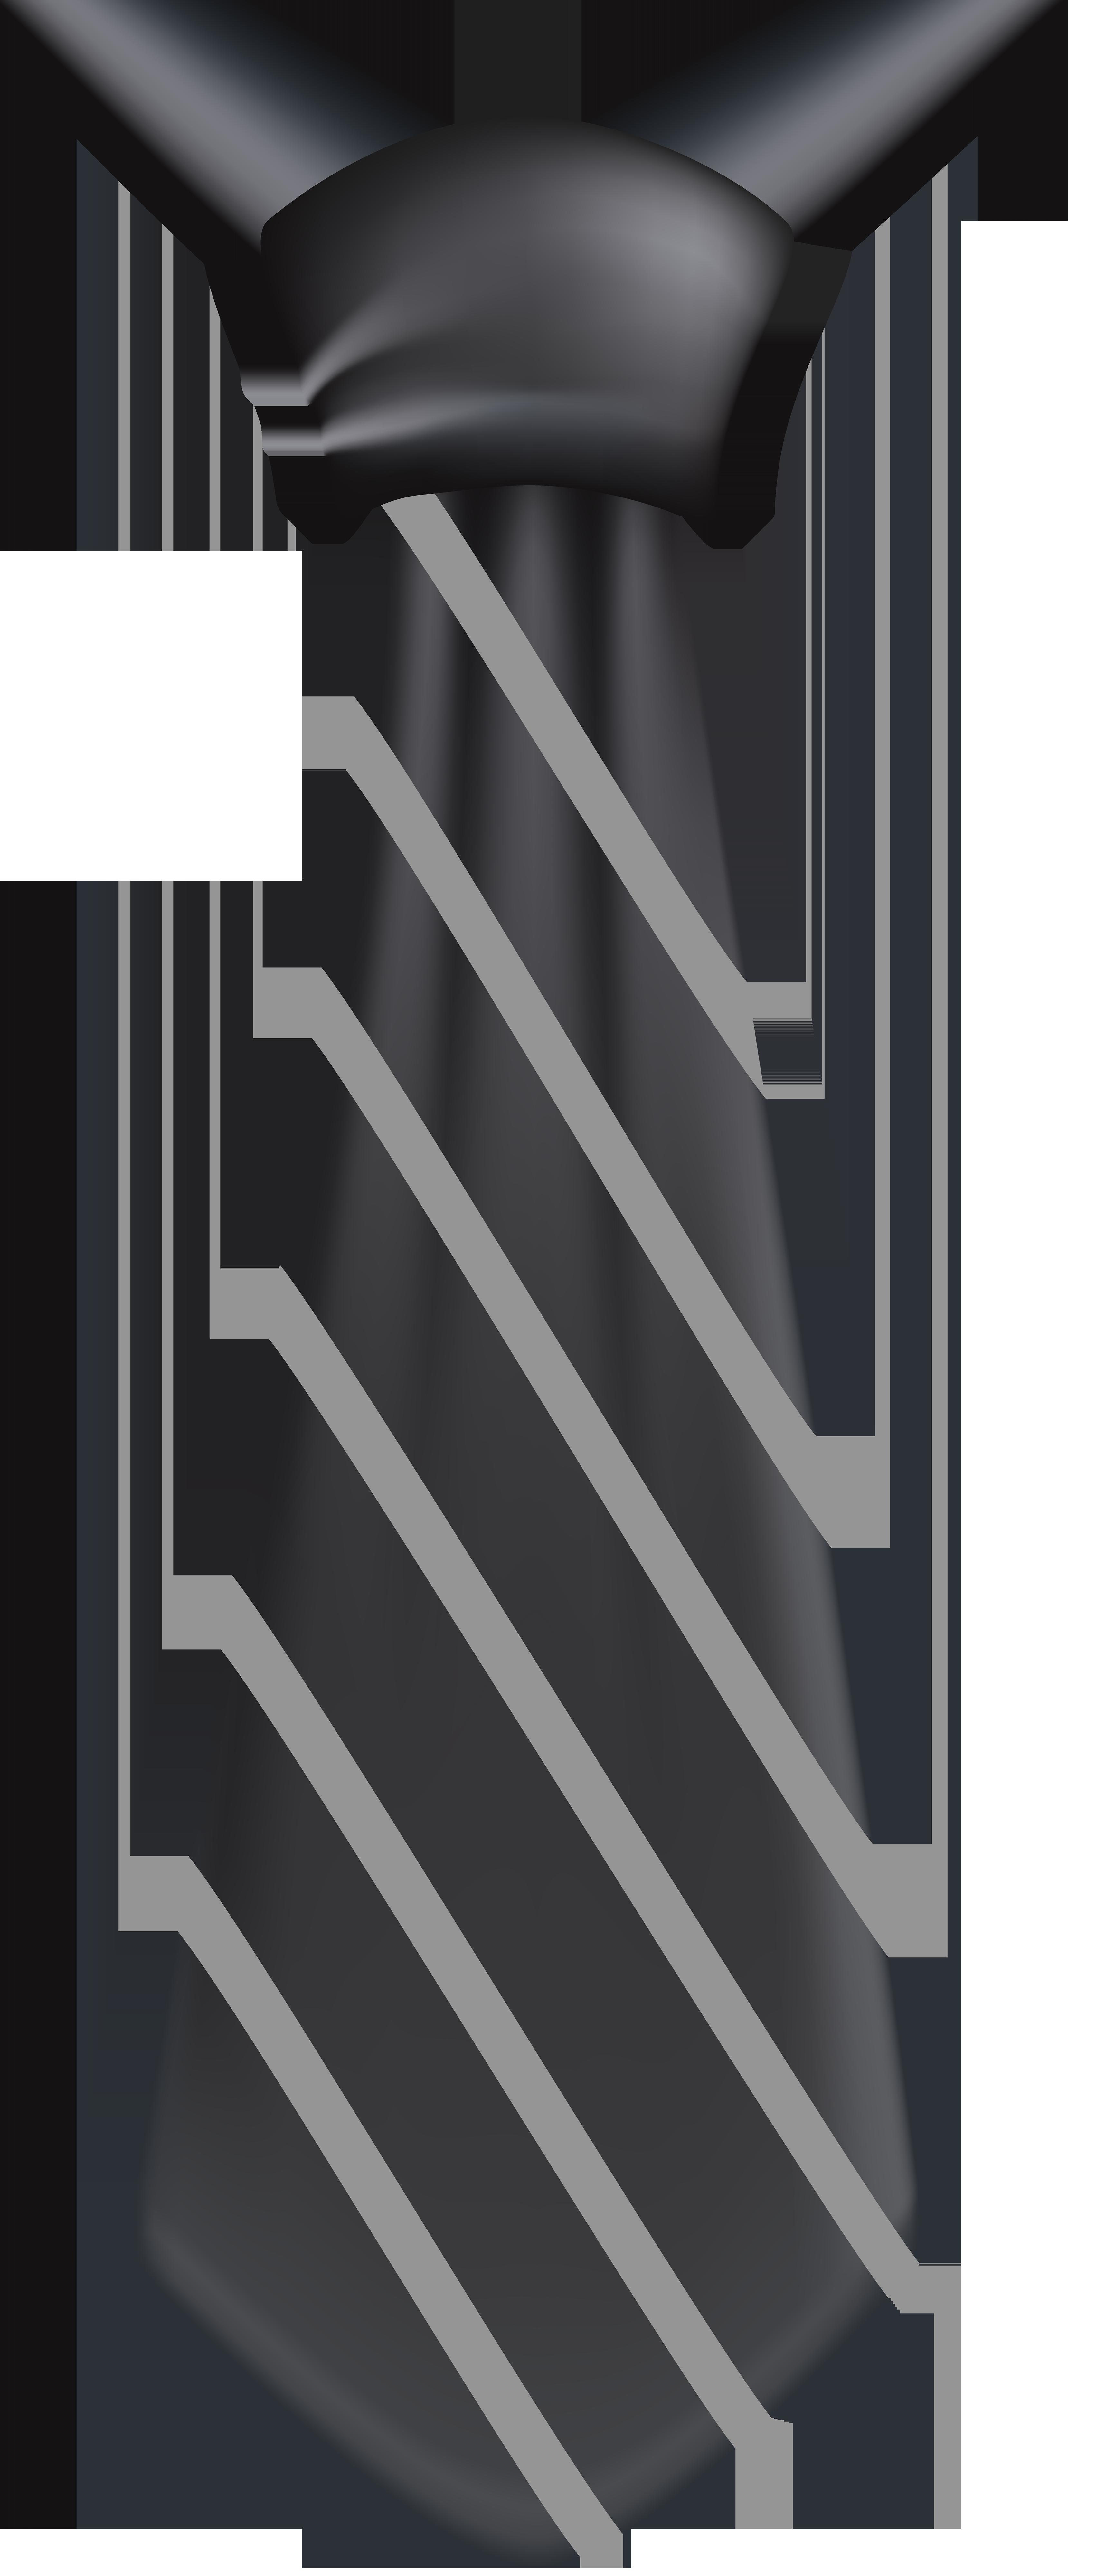 banner Png art image gallery. Clip tie